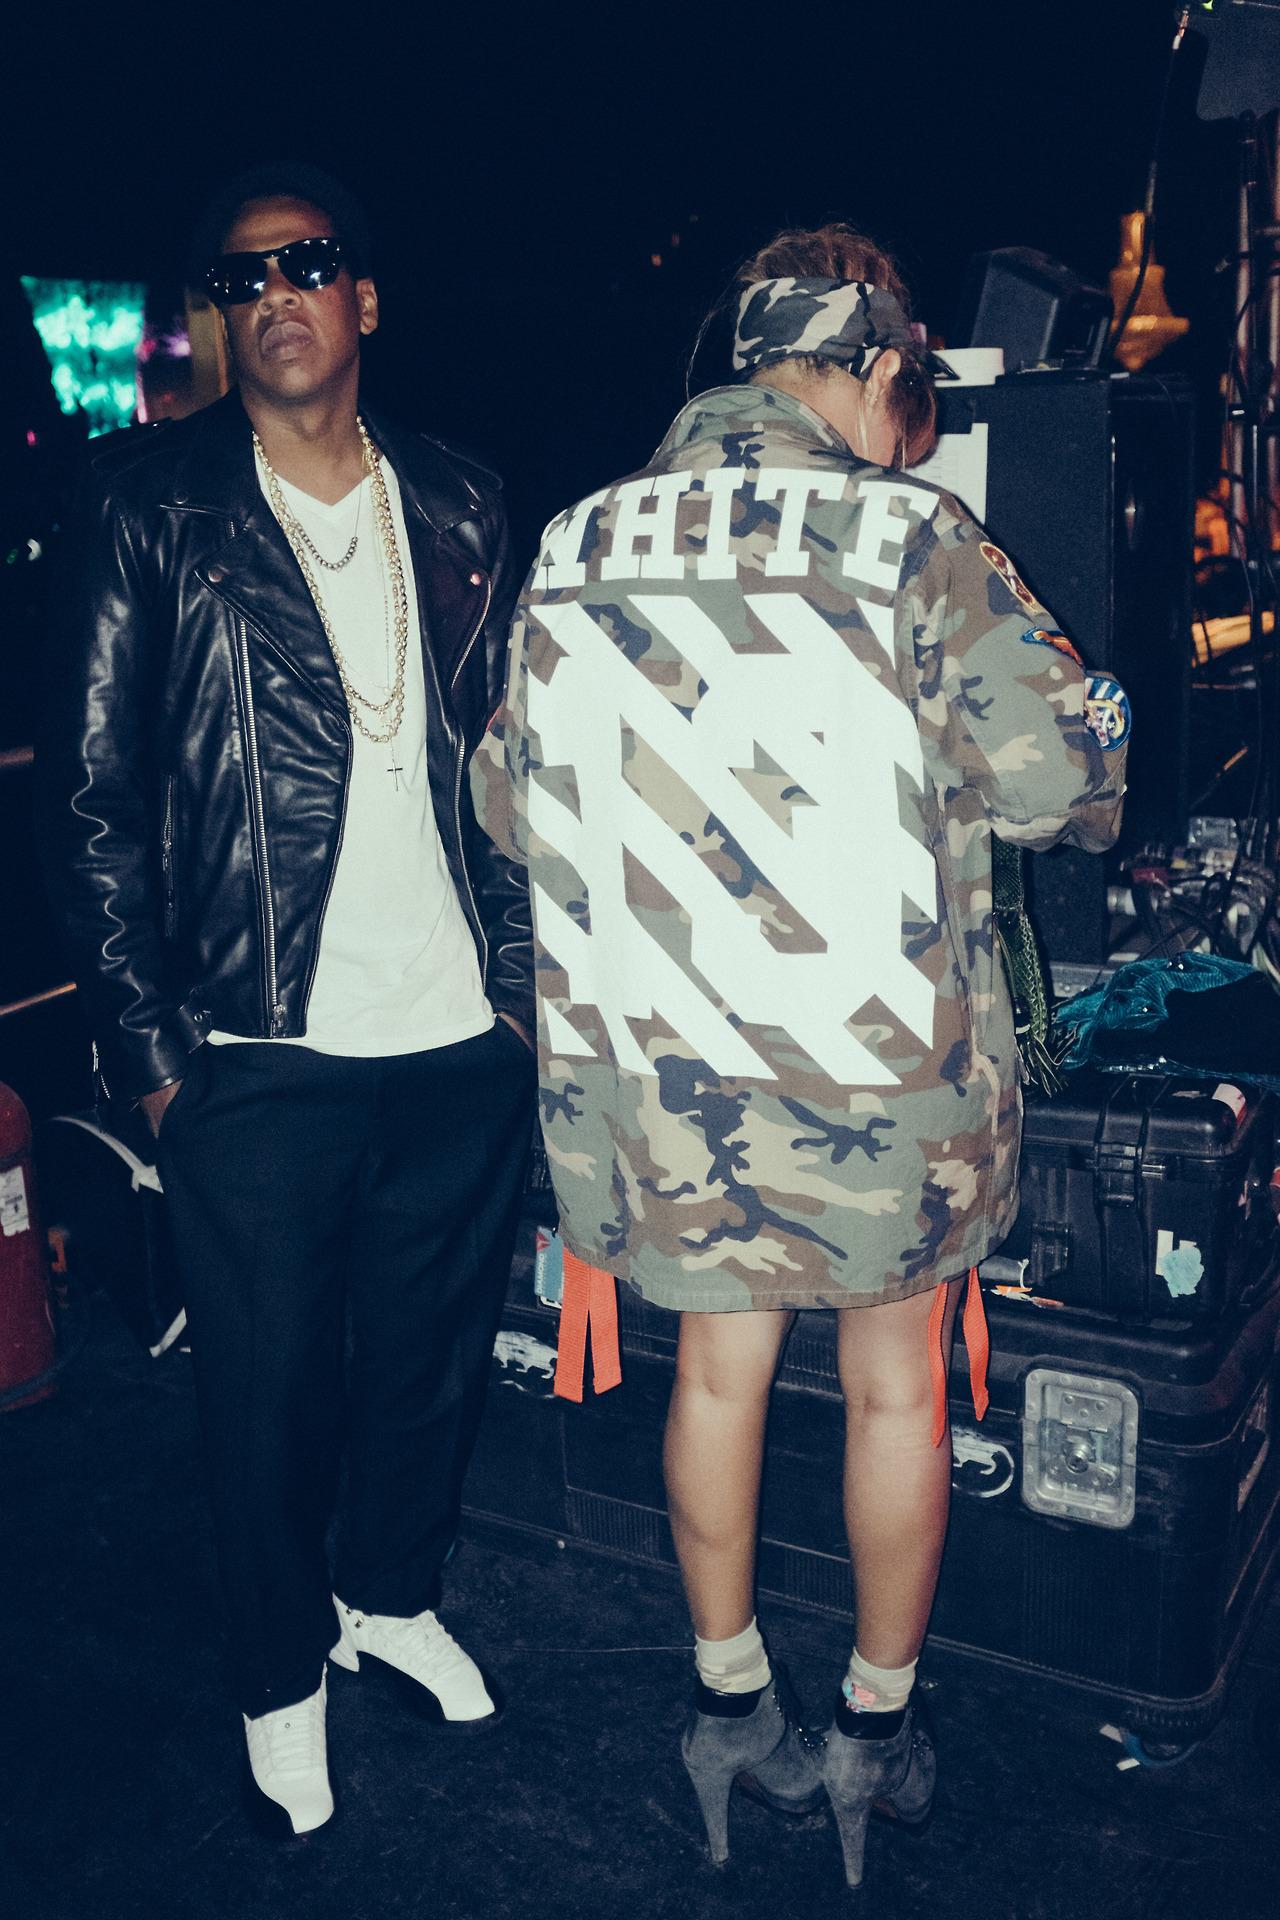 beyonce-jay z backstage-coachella 2014-second weekend-celebrities 2014-the jasmine brand